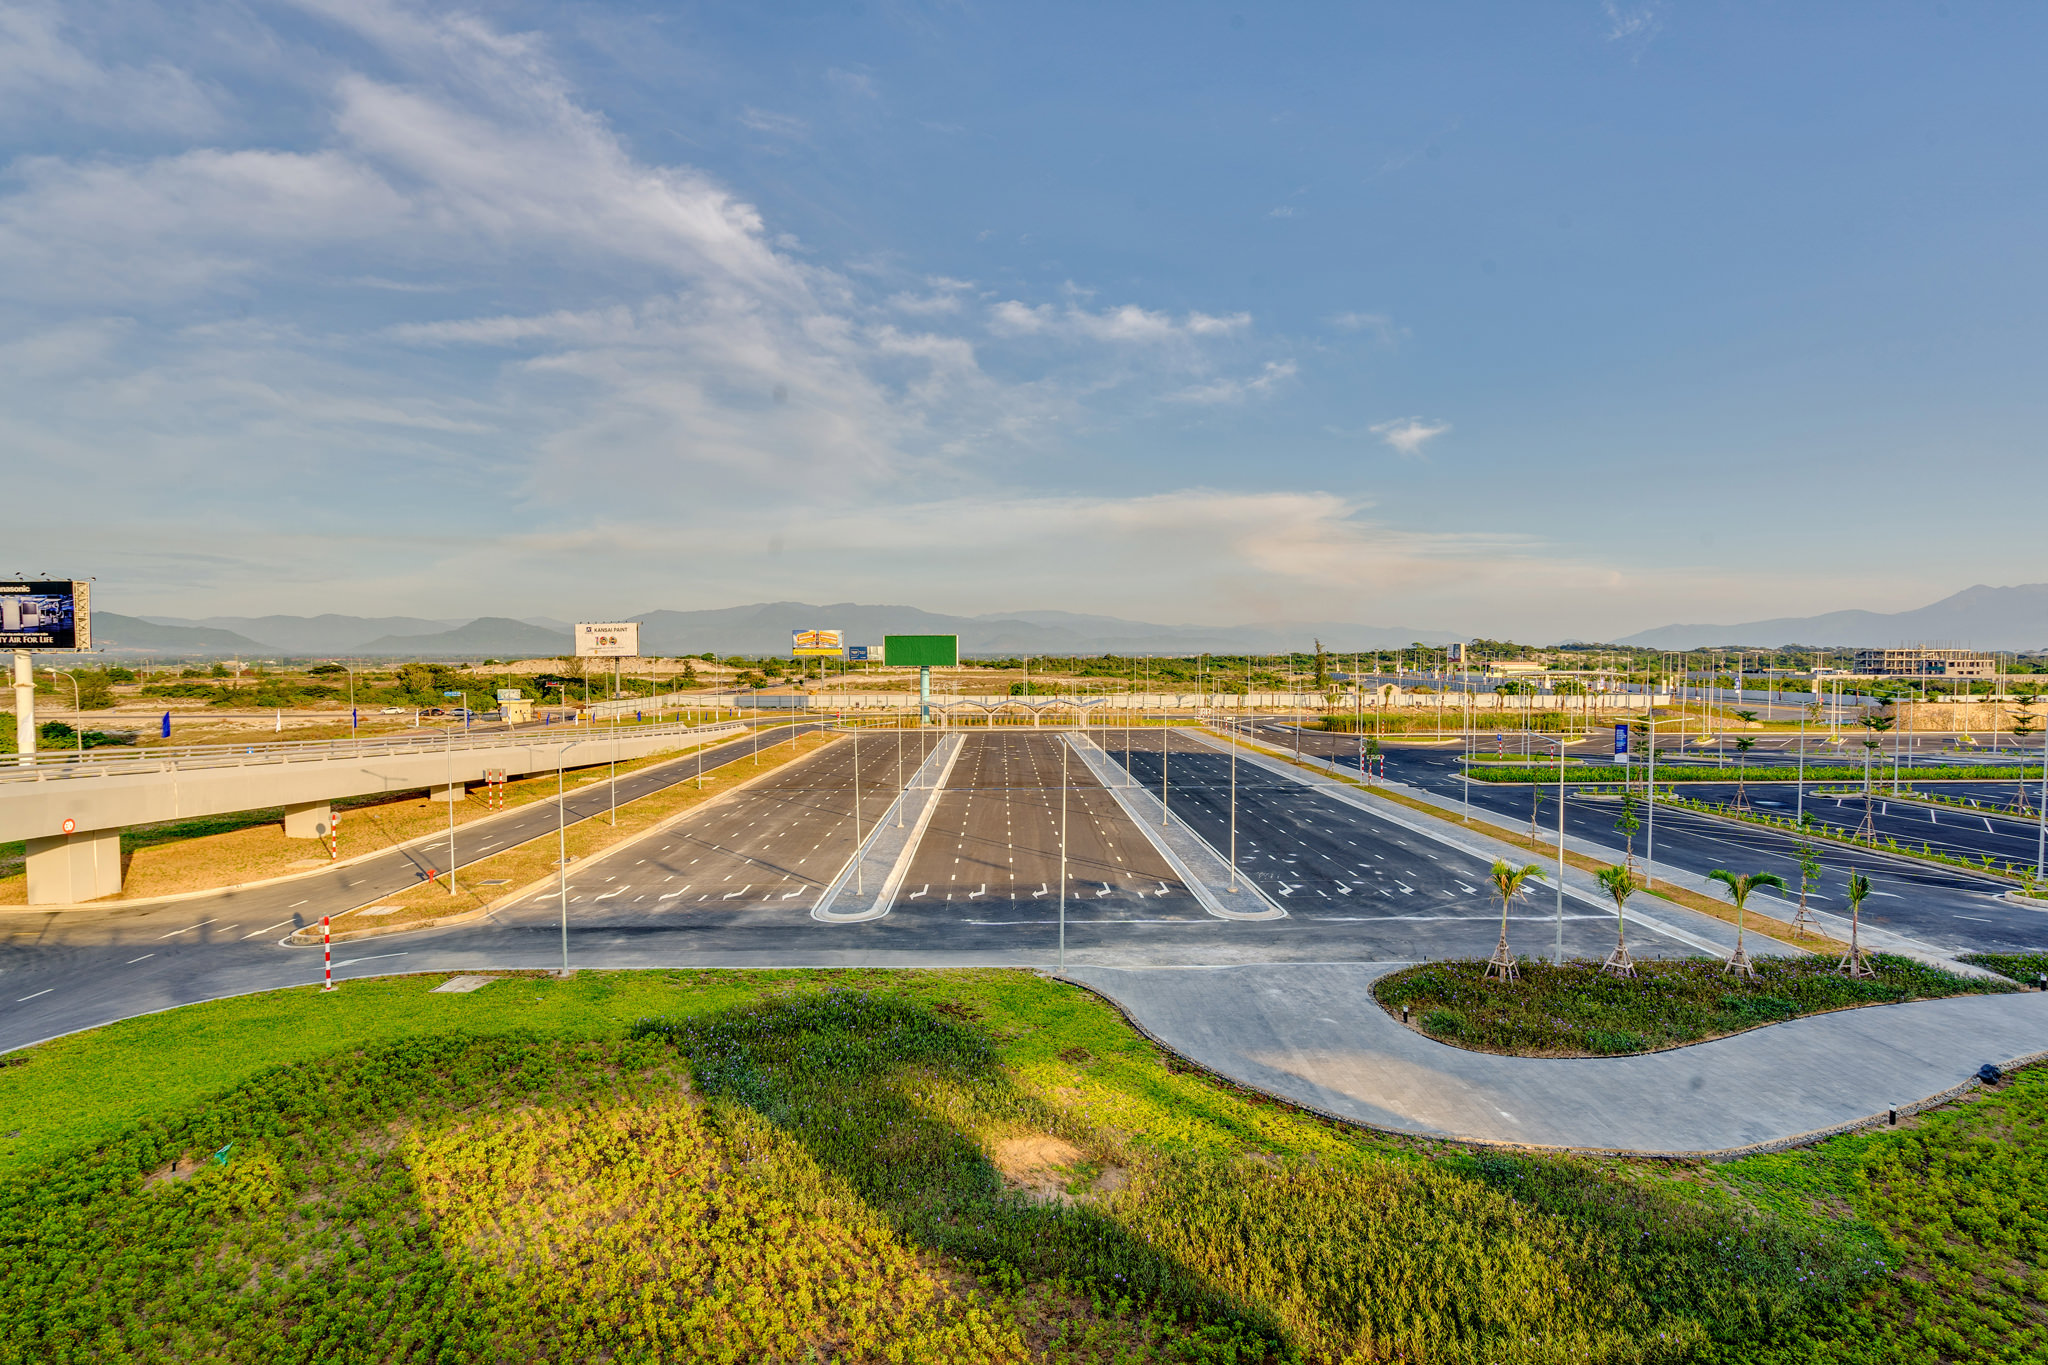 20180626 - Cam Ranh Airport - Architecture - 0101.jpg